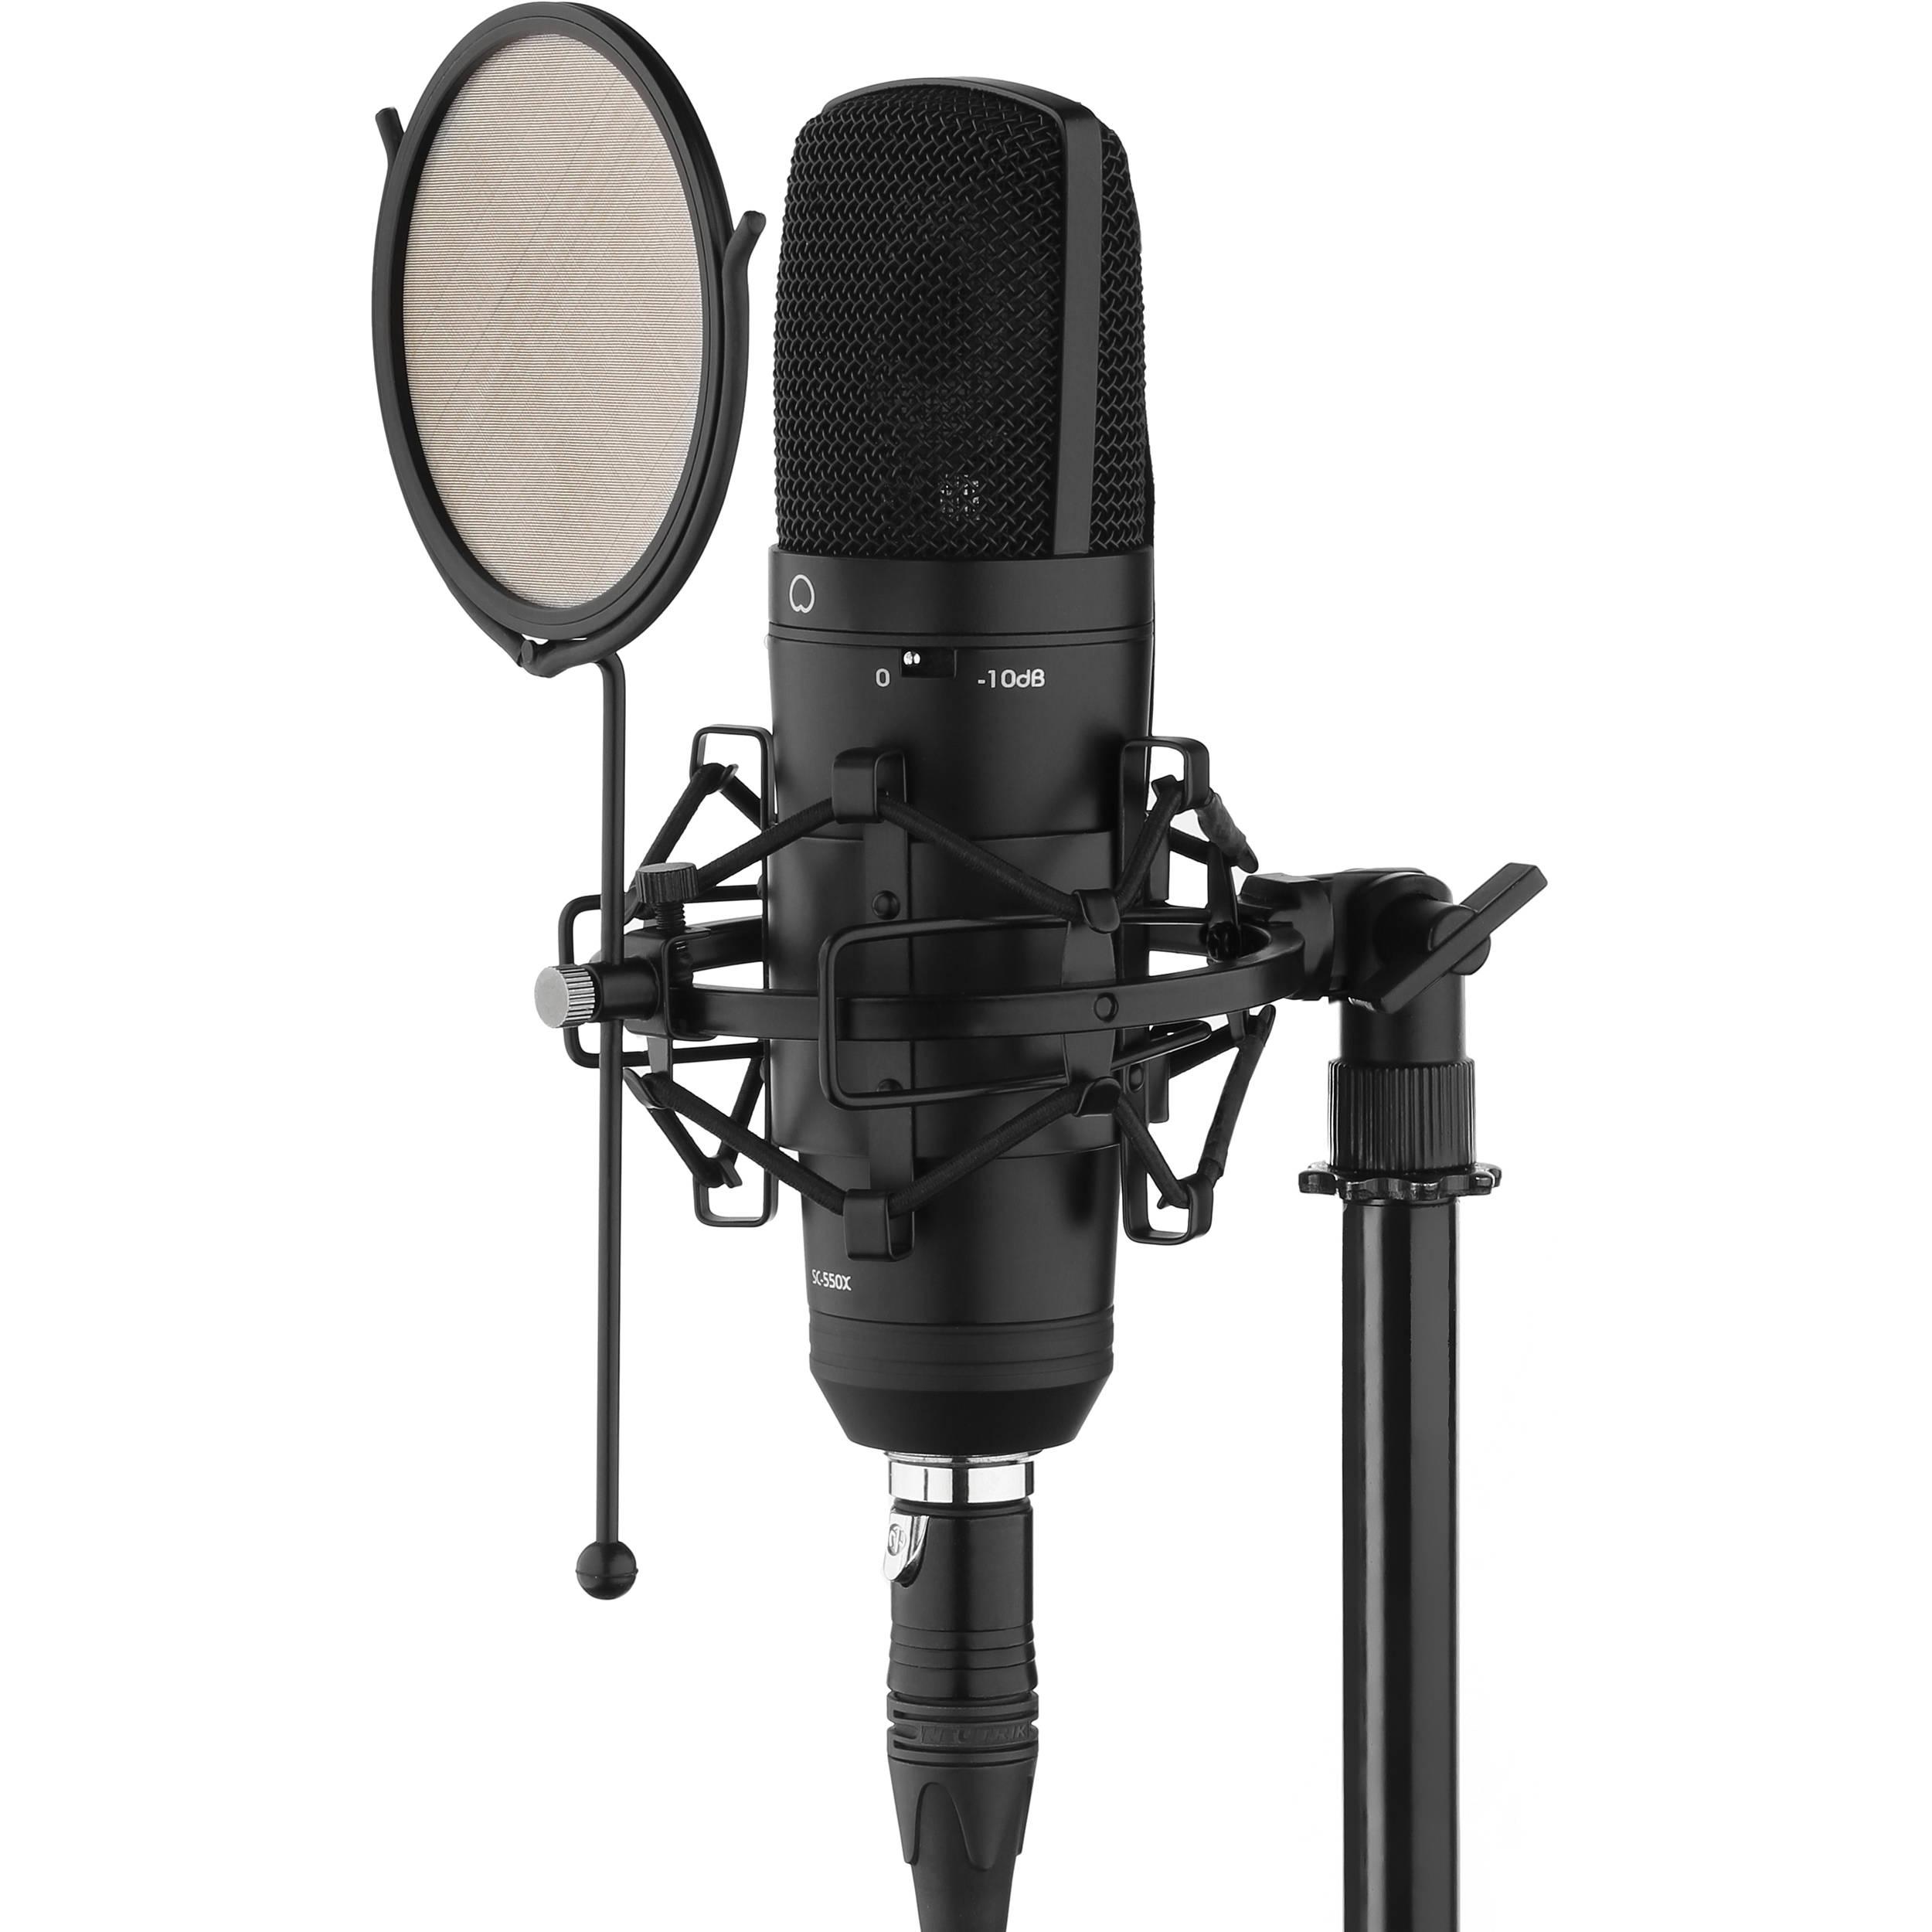 Senal SC-550X Professional Cardioid Condenser Microphone $69.99 @ B&H Photo w/ Free Shipping